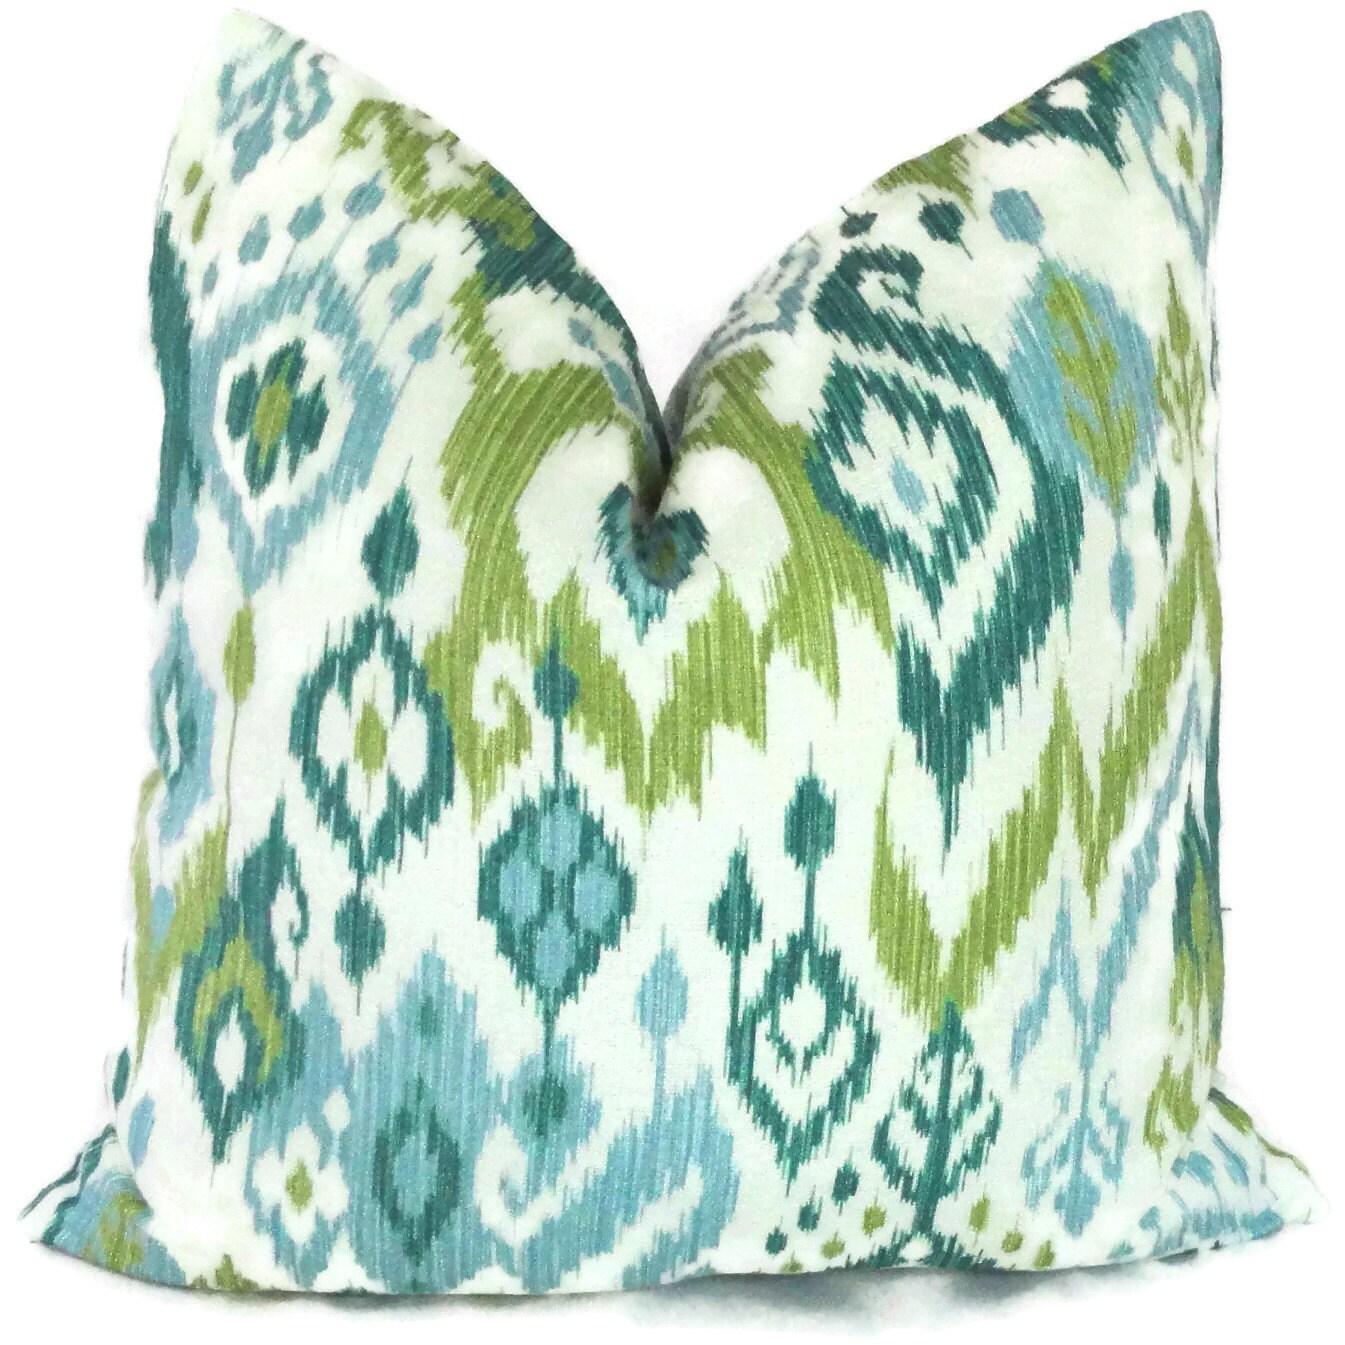 Green Ikat Throw Pillow : SALE Aqua and Green Ikat Decorative Pillow Cover by PopOColor